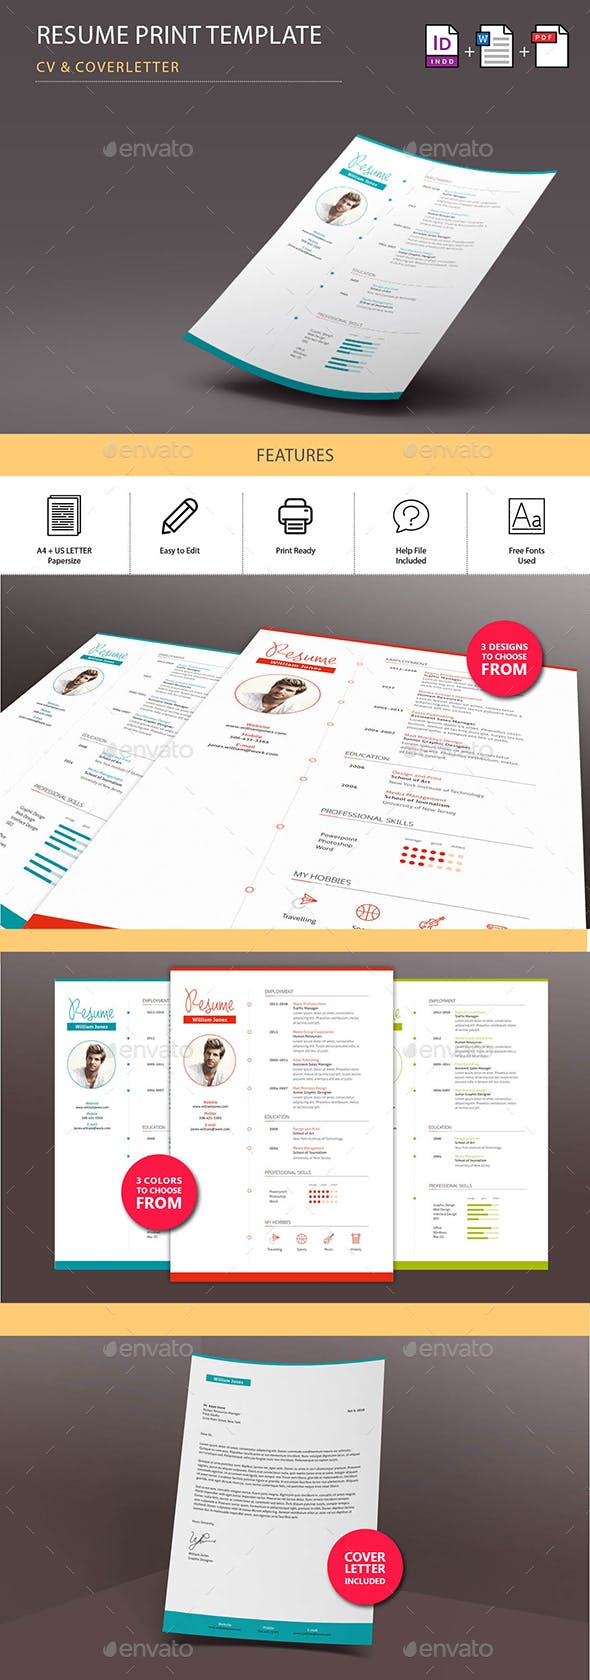 jennifer resumecv print template resumes stationery